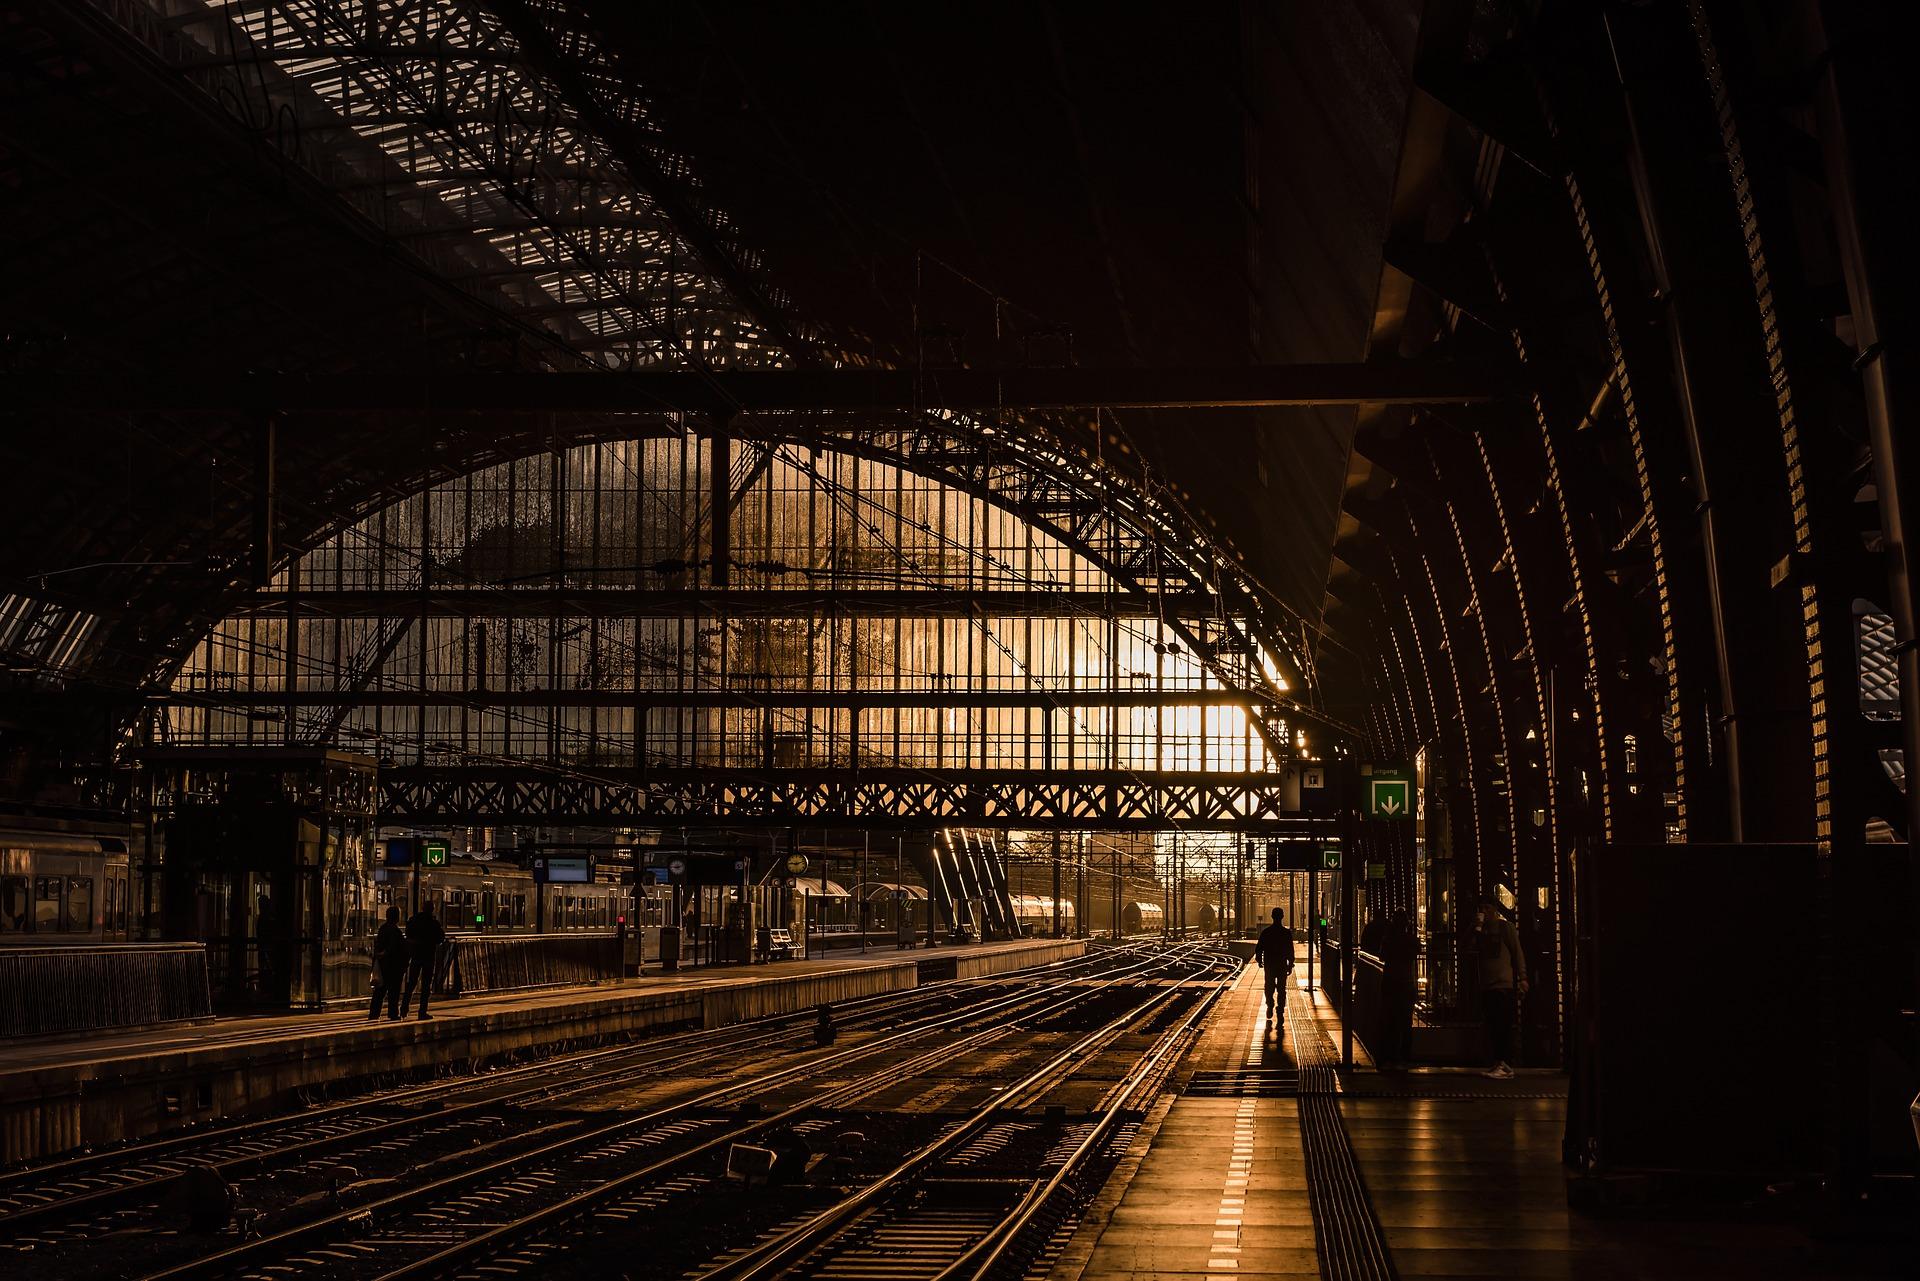 station-839208_1920.jpg